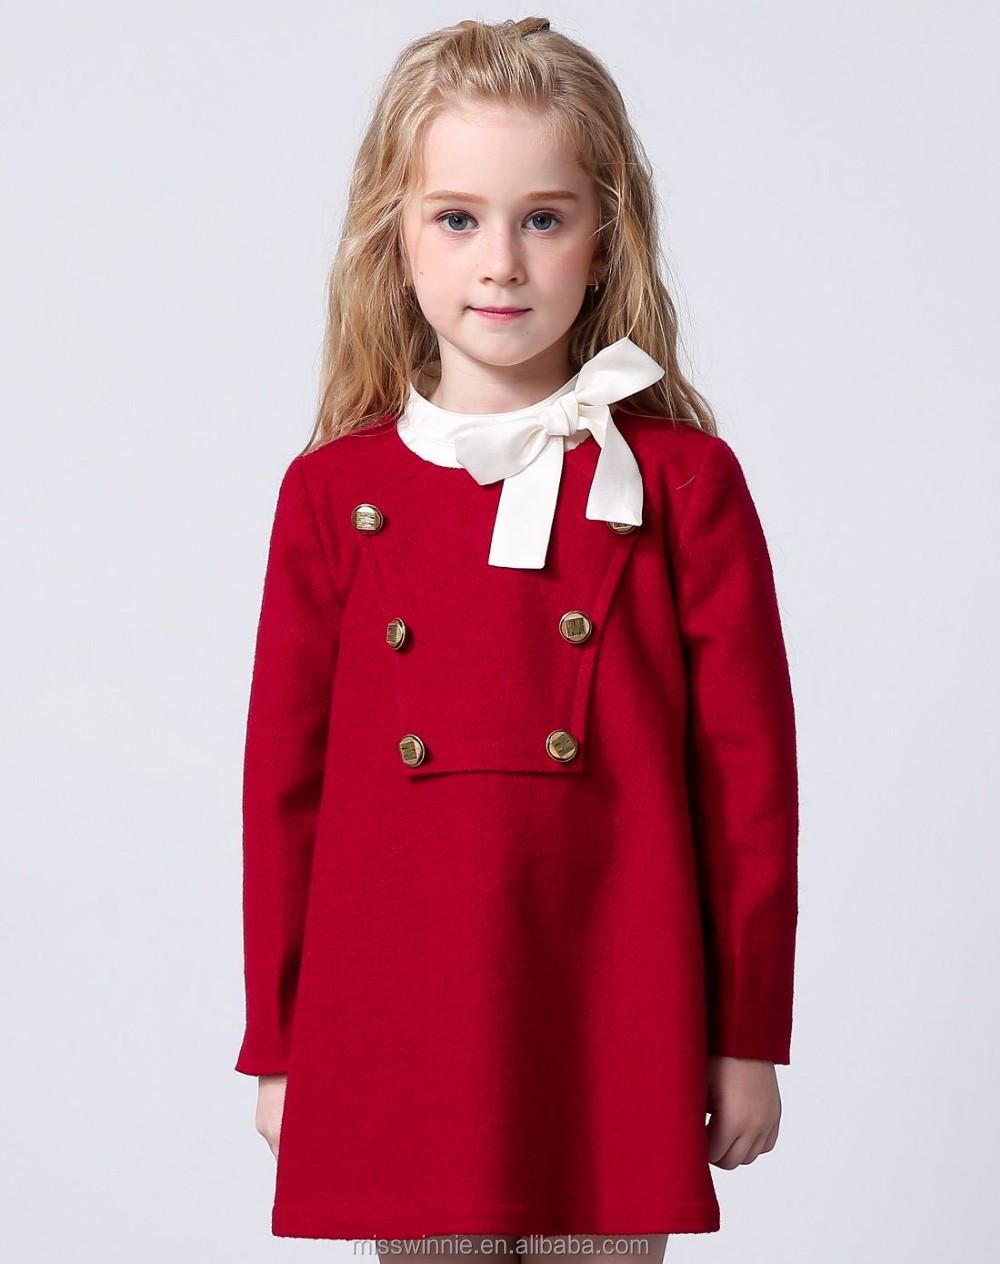 Modelos de vestidos manga larga para ninas